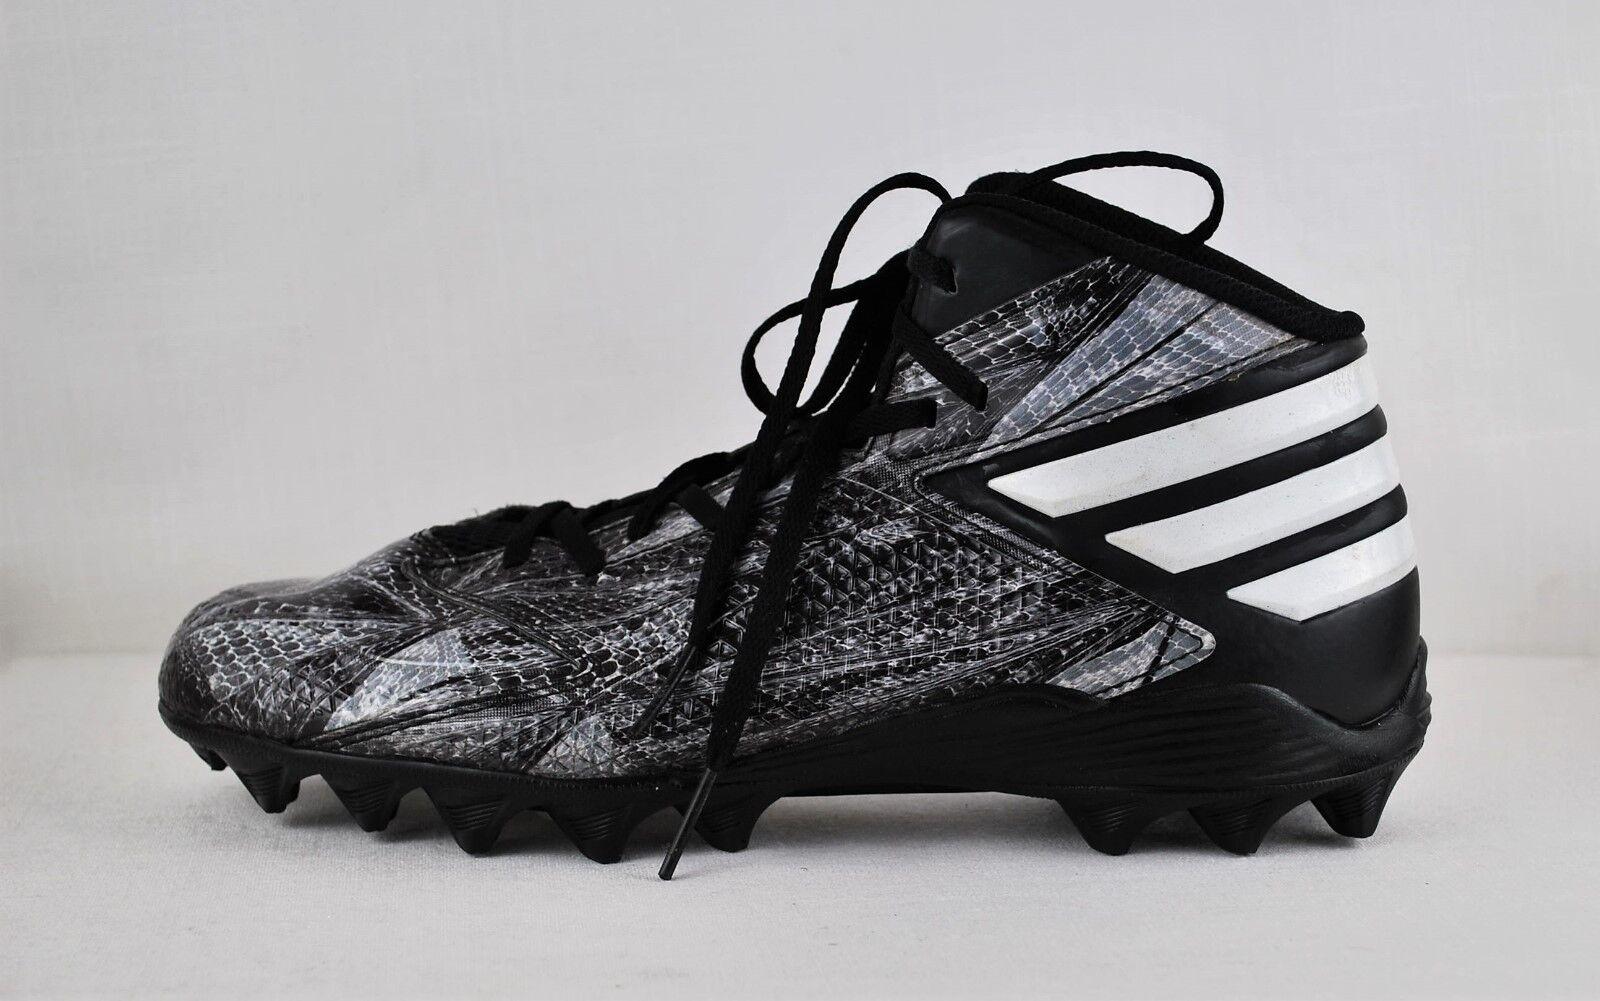 Adidas Men's Hi Top Basketball Animal Print Sneakers Comfortable Brand discount